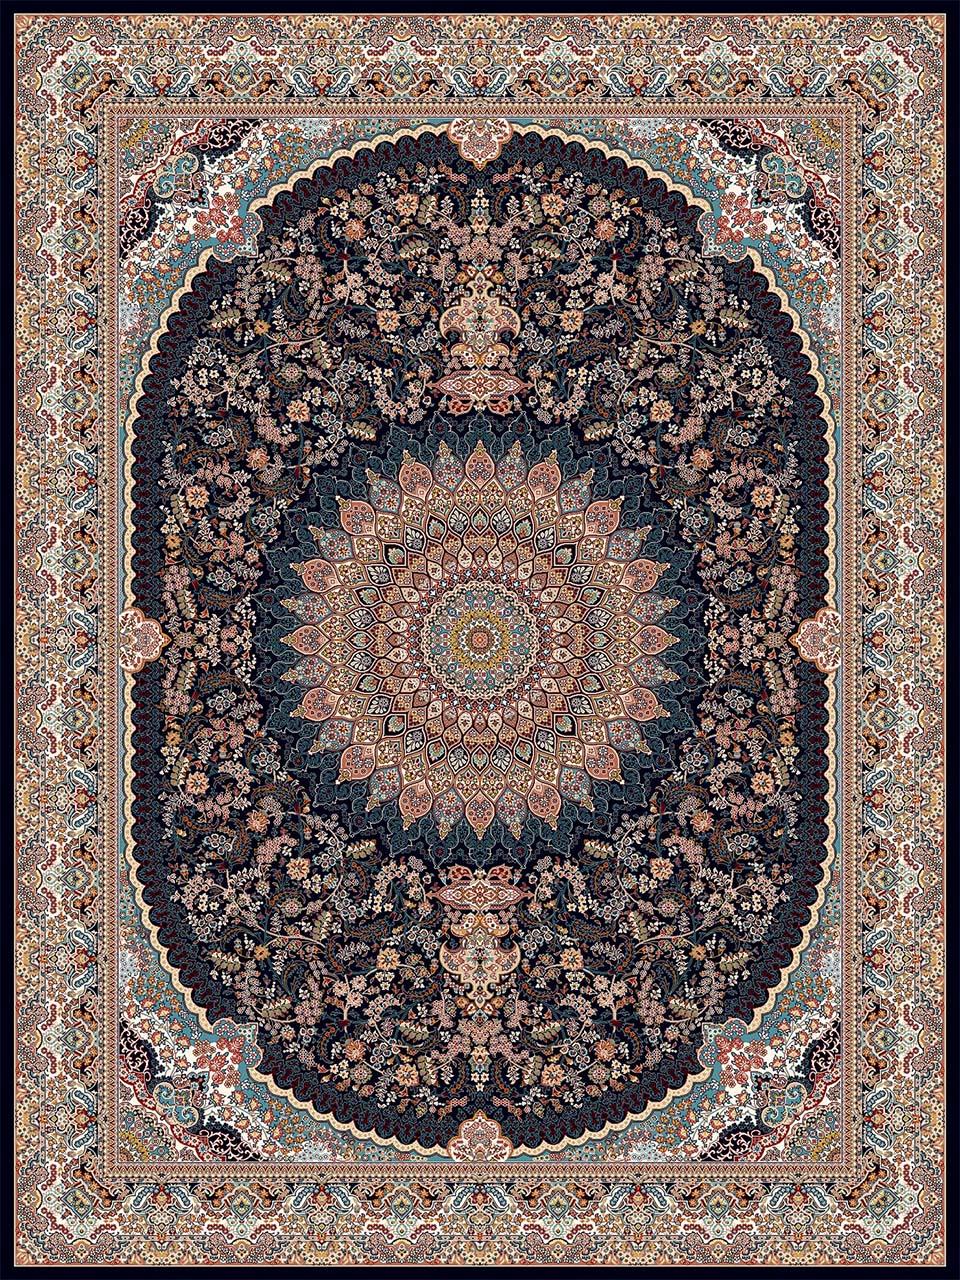 فرش (18139) اکریلیک - 8 رنگ - 500 شانه - سورمه اي - تراکم 1000